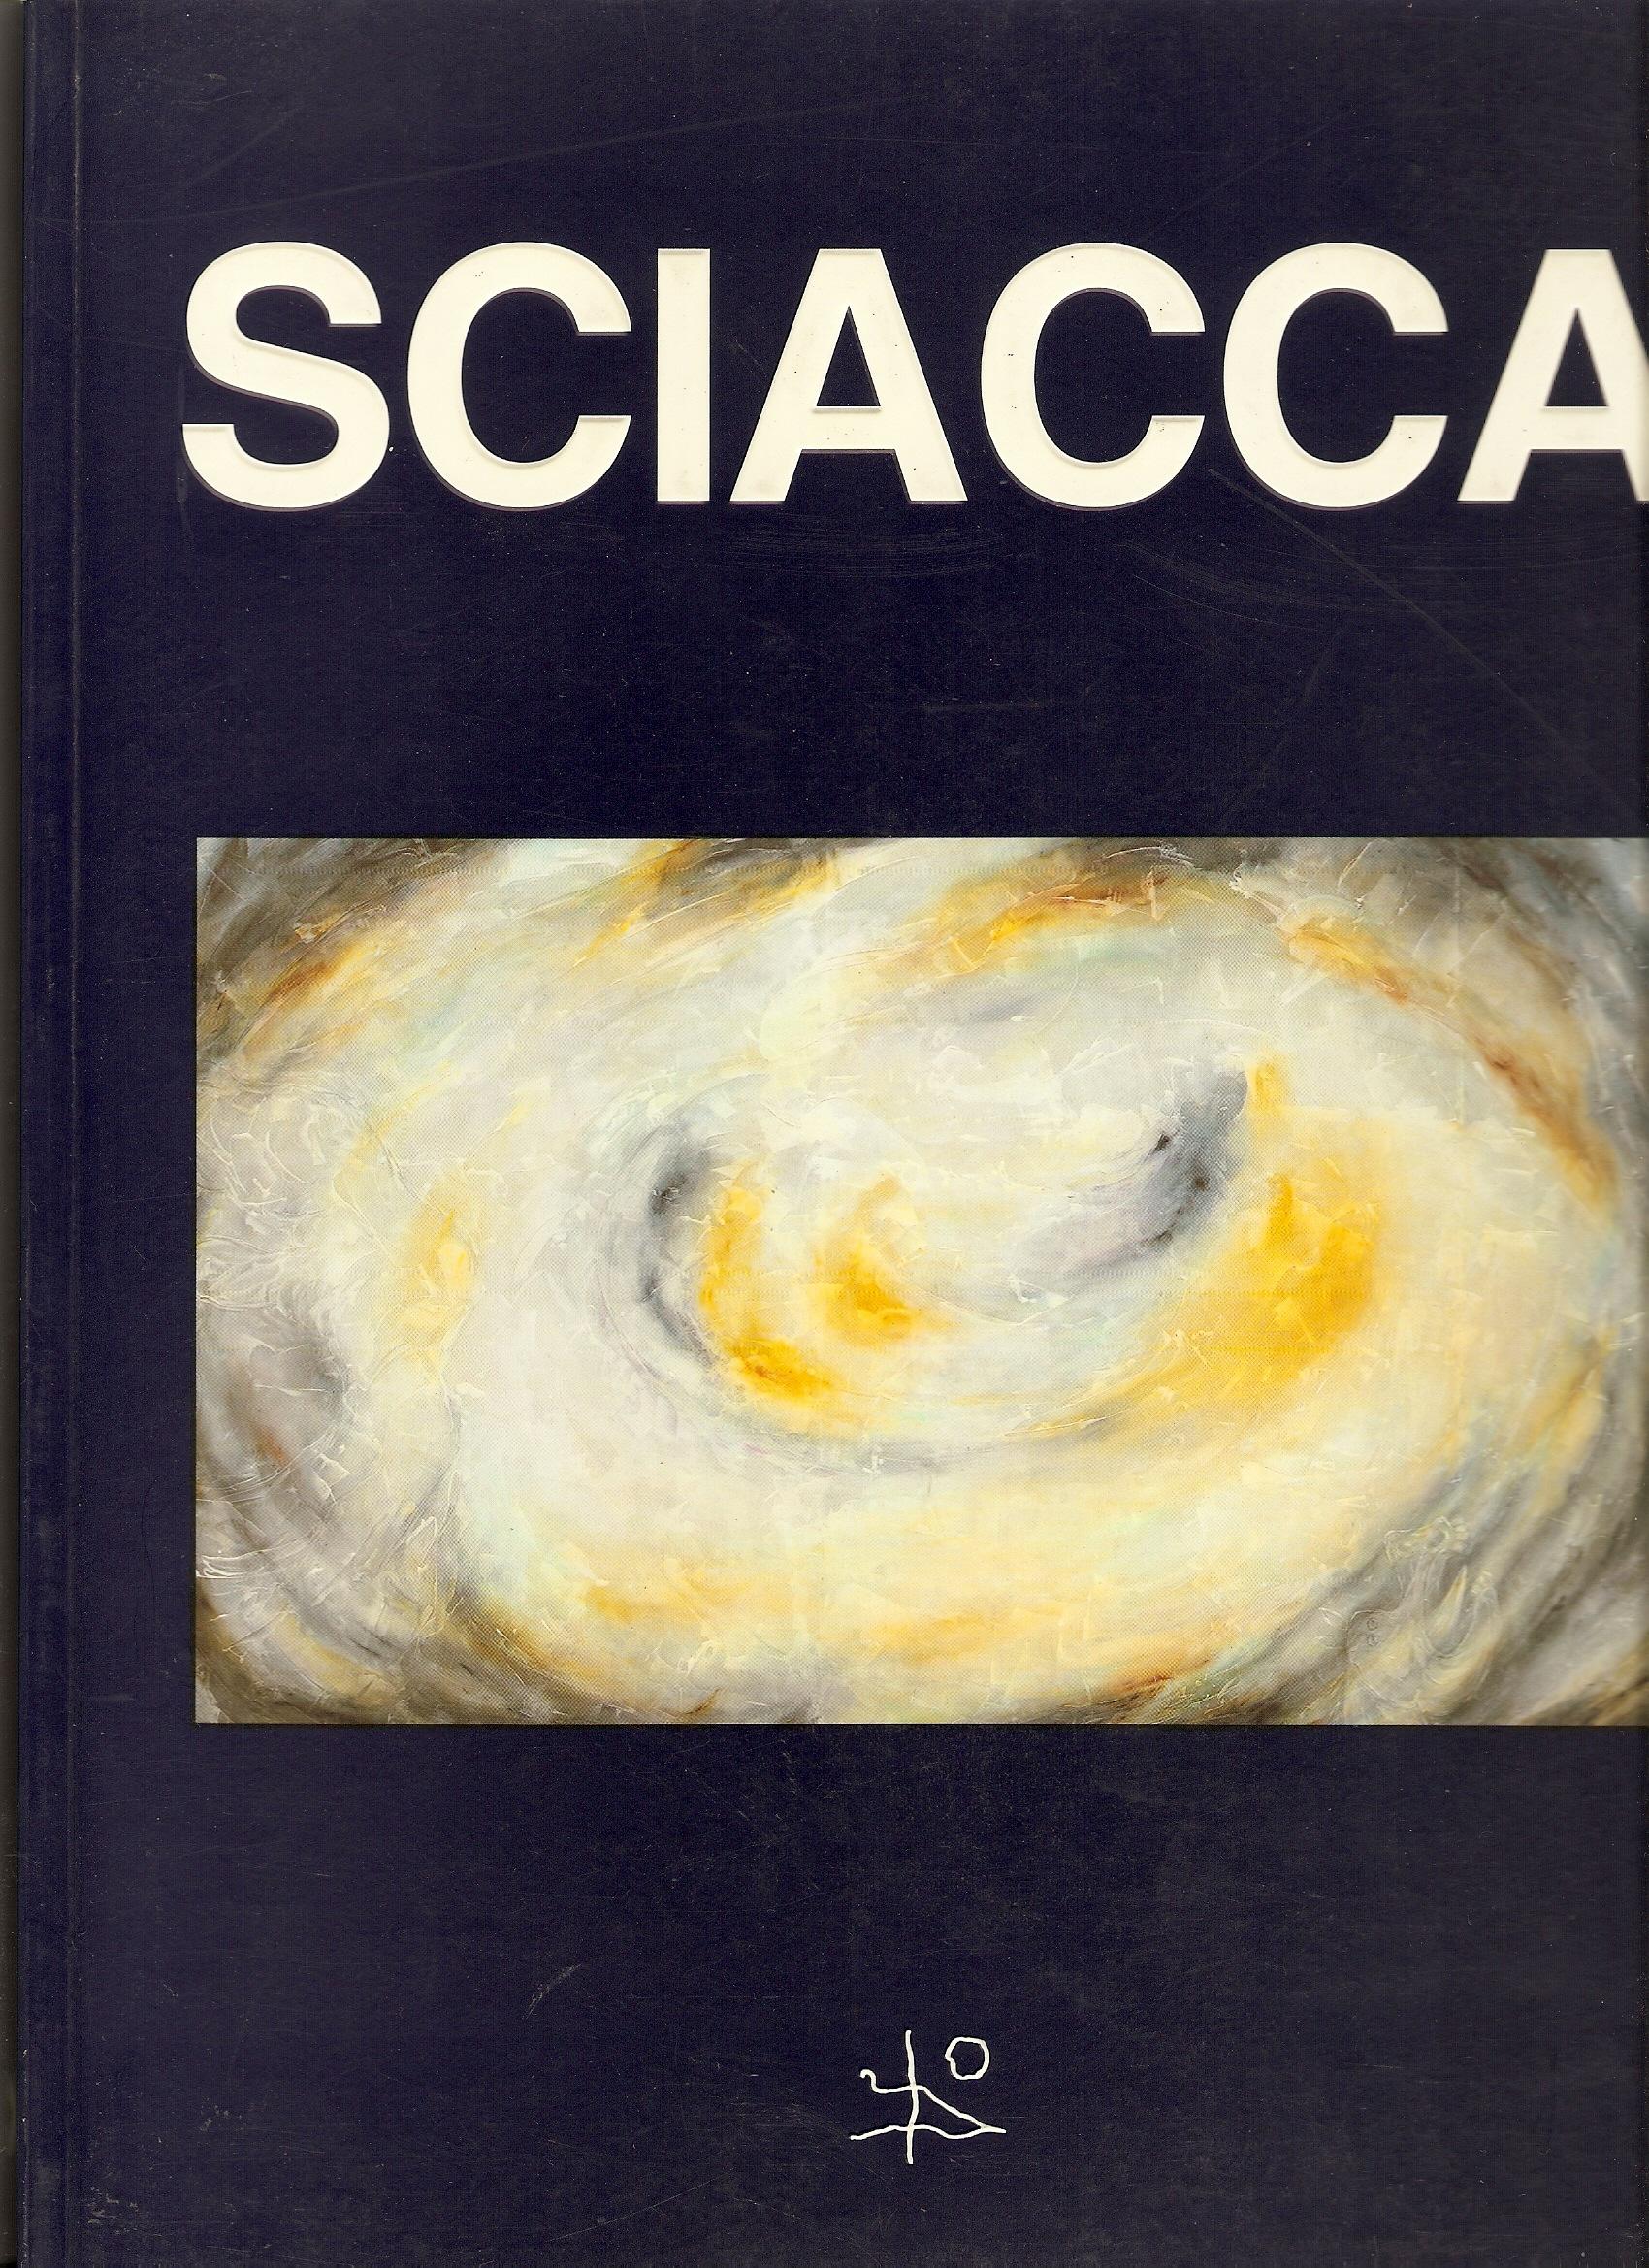 Sciacca